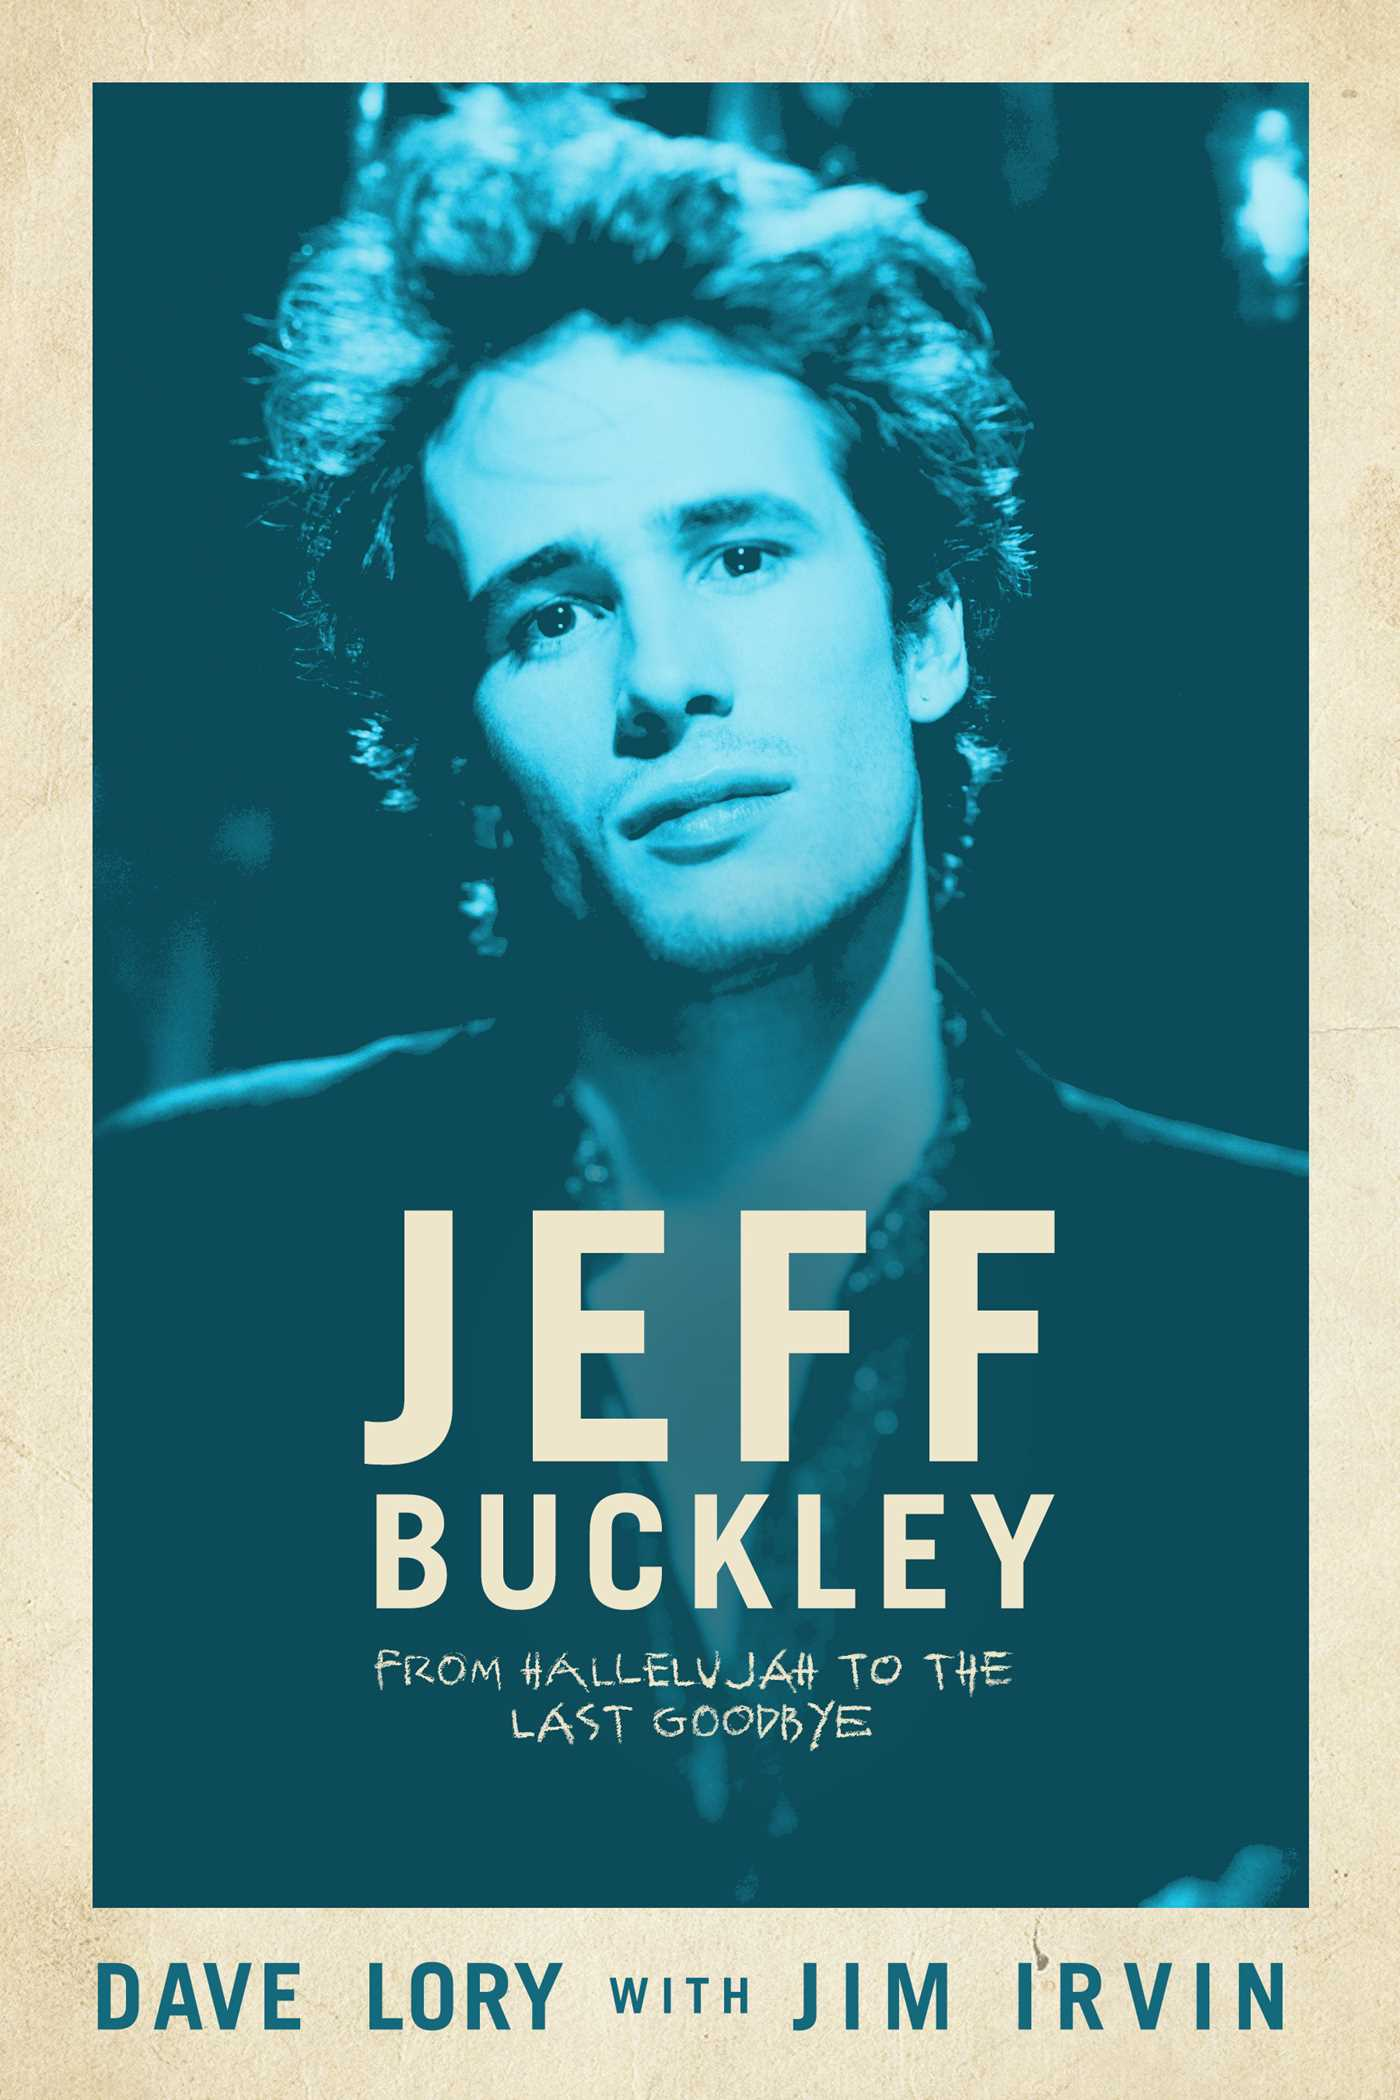 Jeff buckley 9781682615744 hr